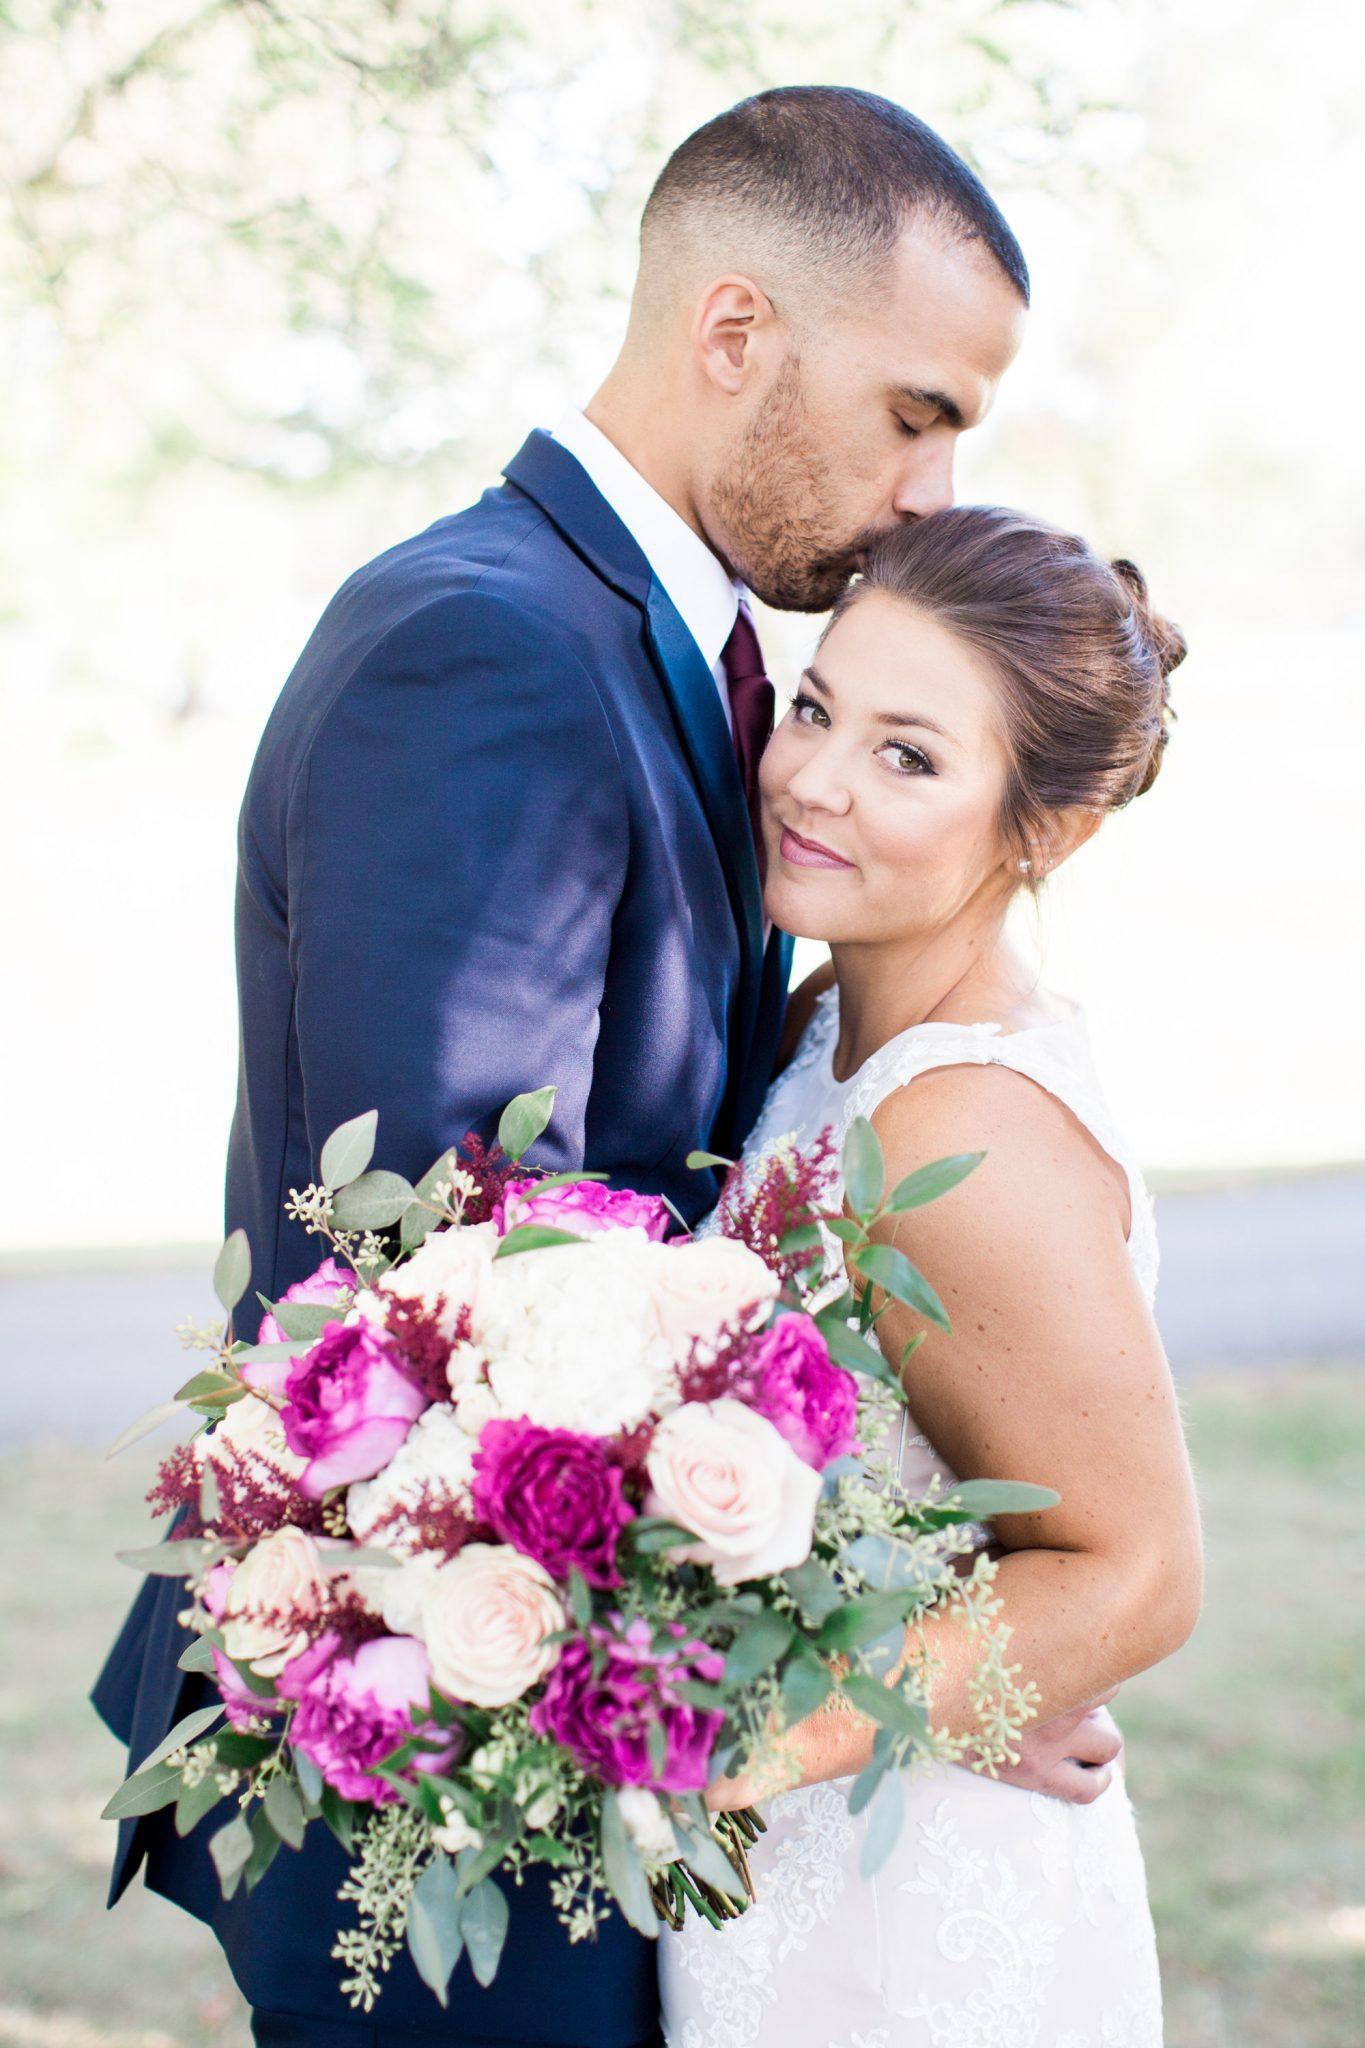 Bridal bouquet, bride and groom, Dayton Ohio wedding florist